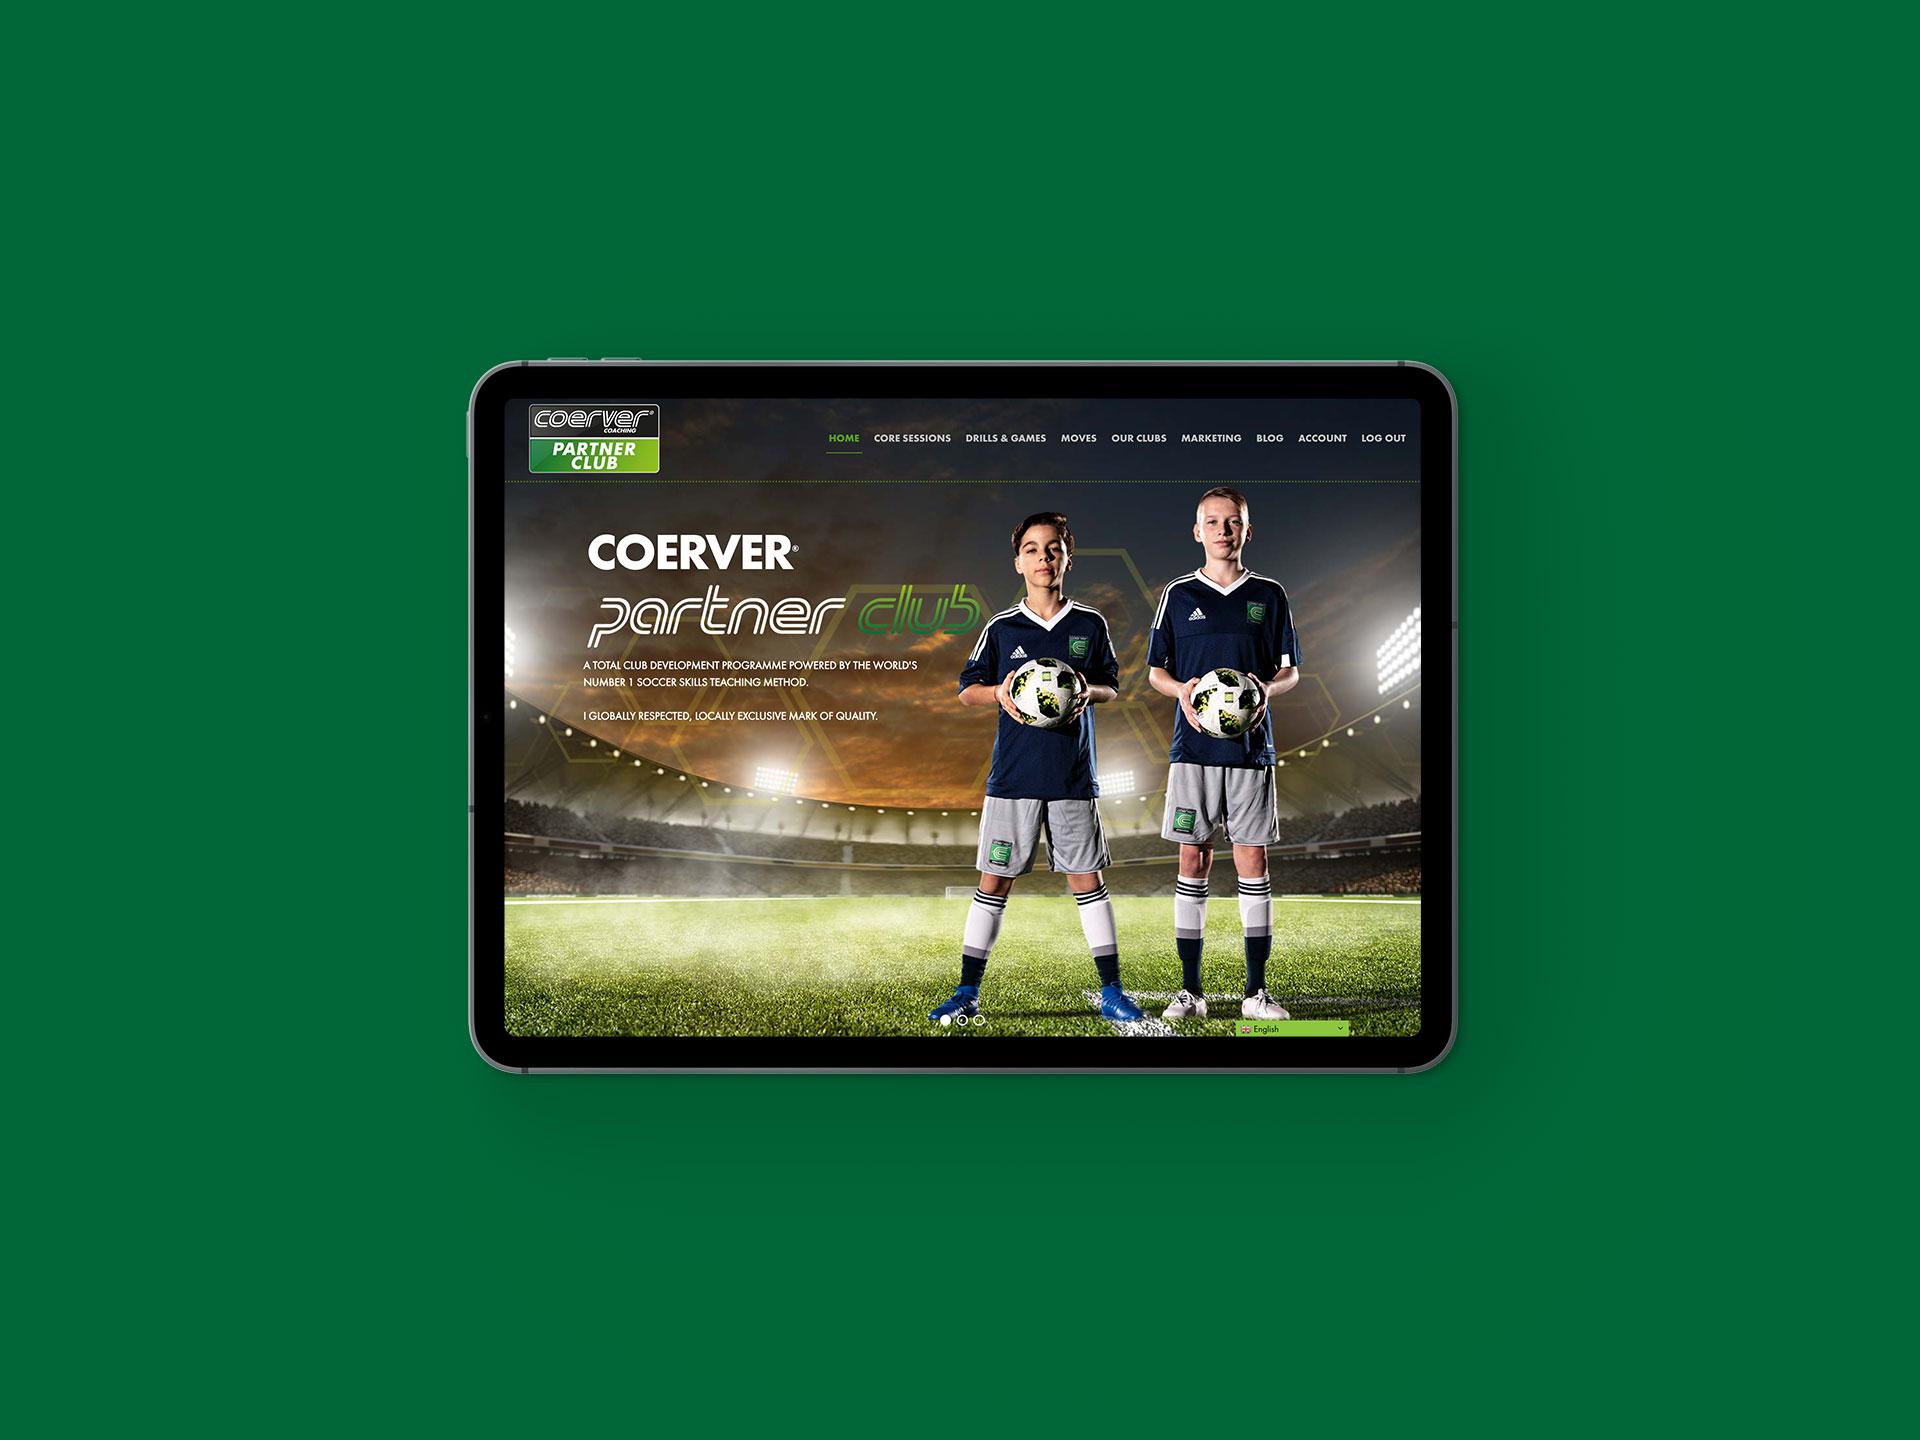 Coerver Partner Club Website